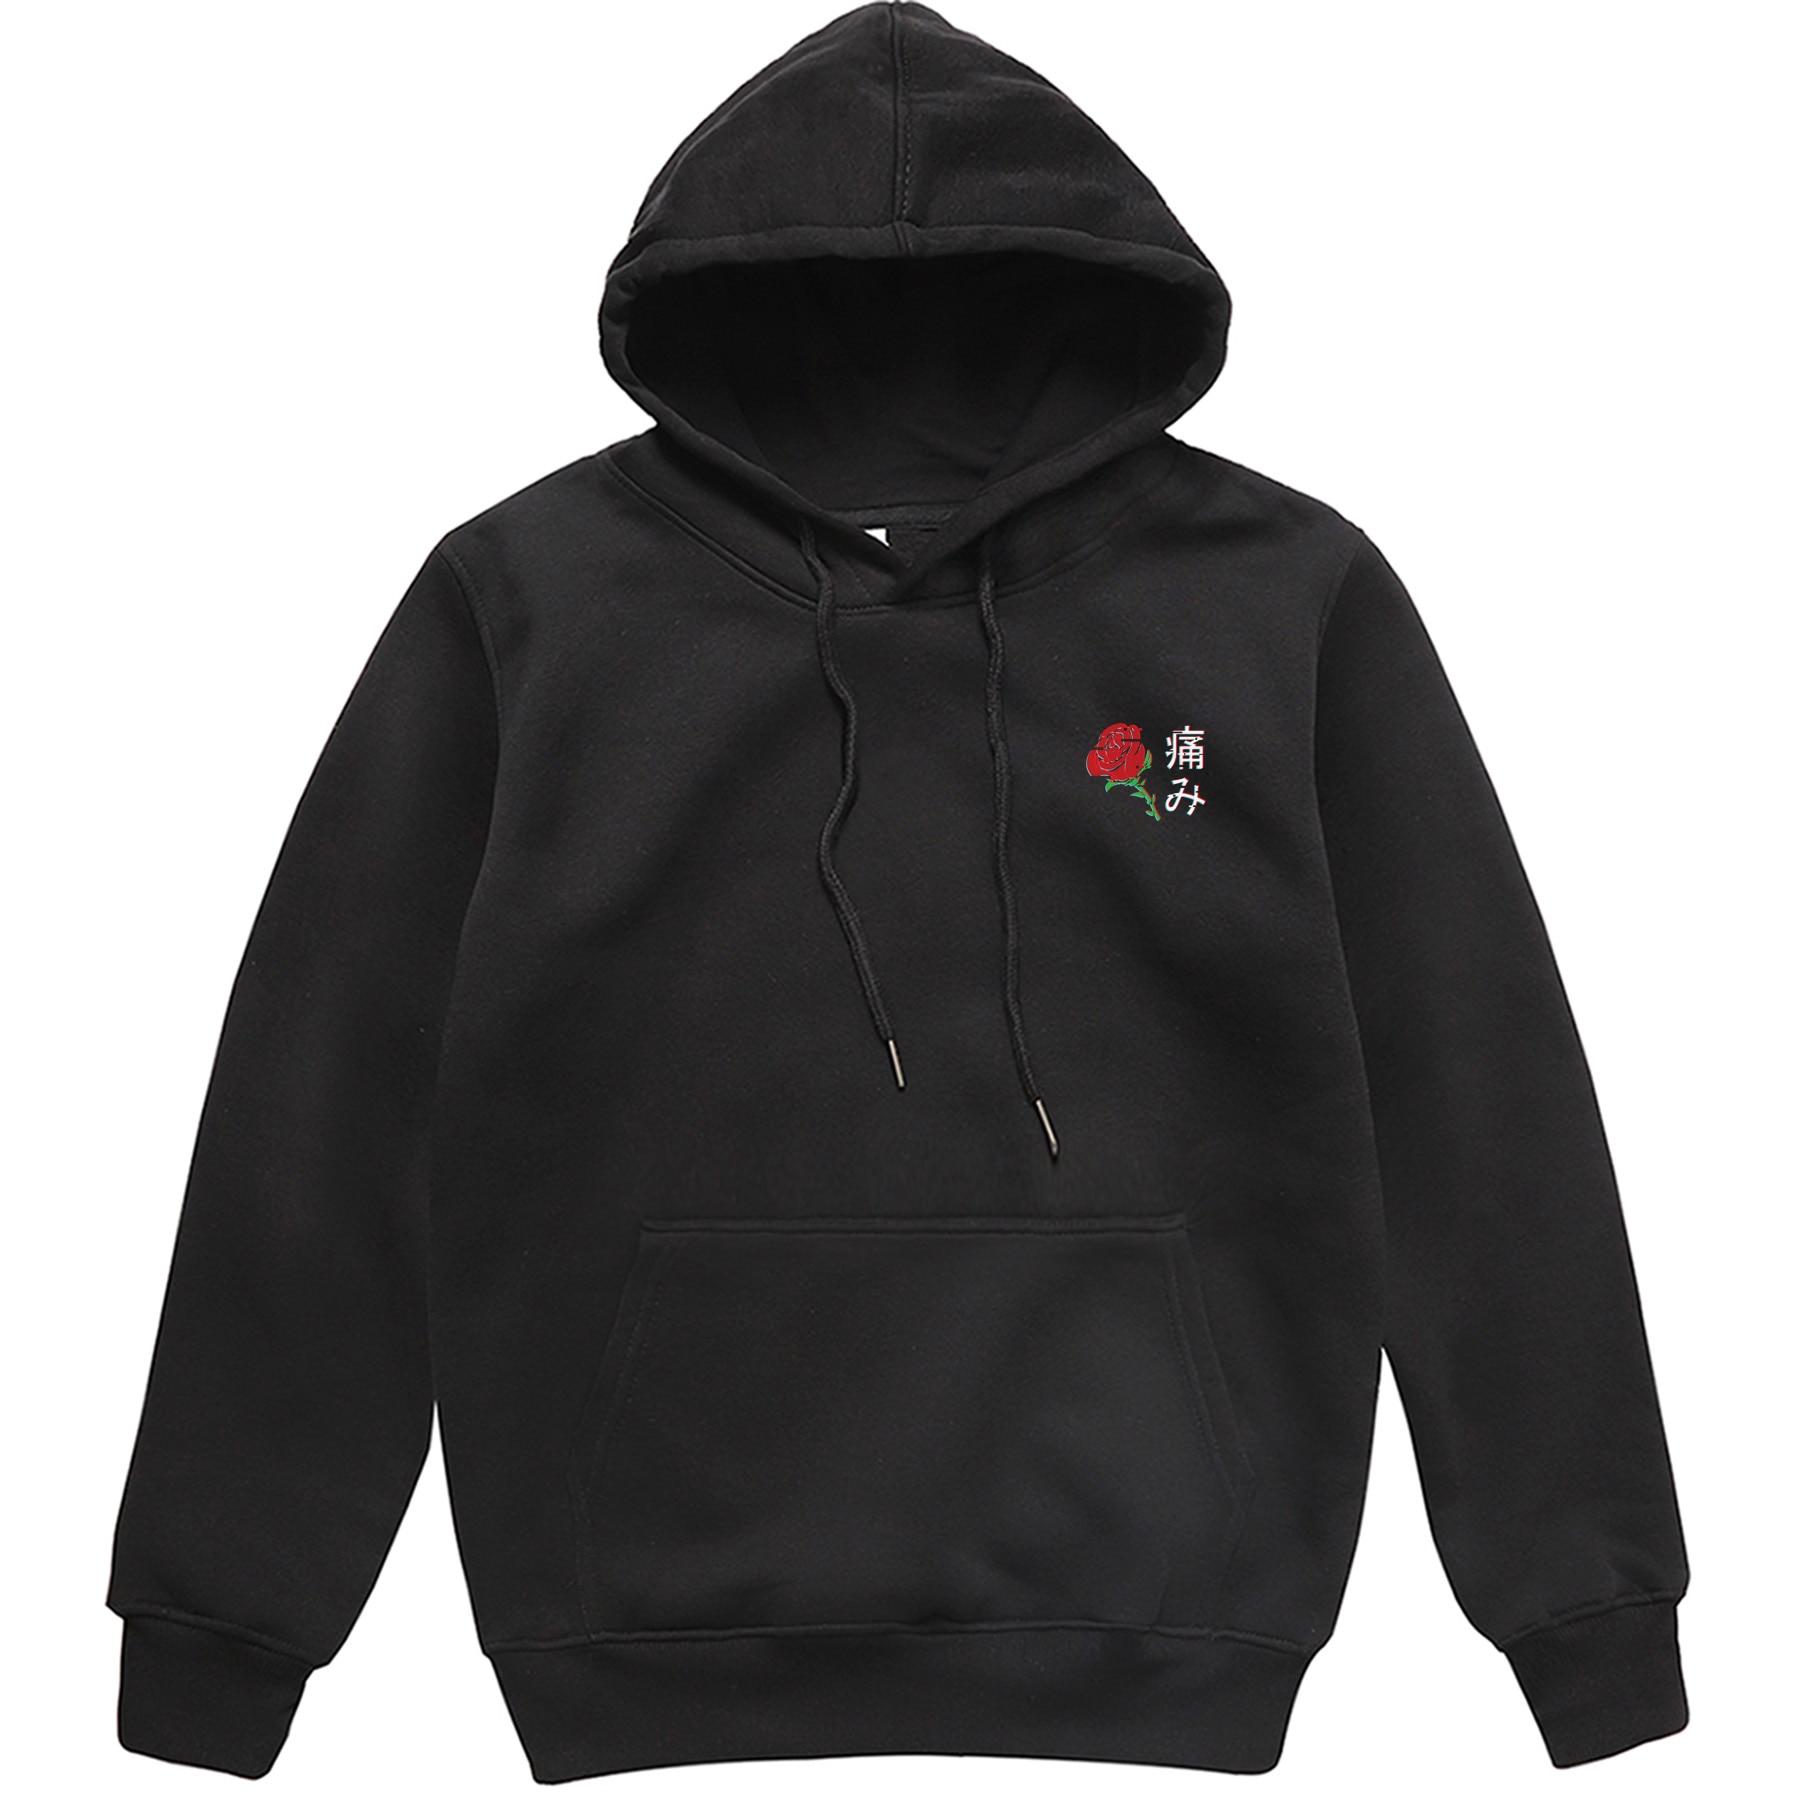 Japanese Aesthetic Rose Pattern Hoodie Men Outerwear Spring Fleece Streetwear Brand Tracksuit Male Harajuku Stylish Sweatshirts